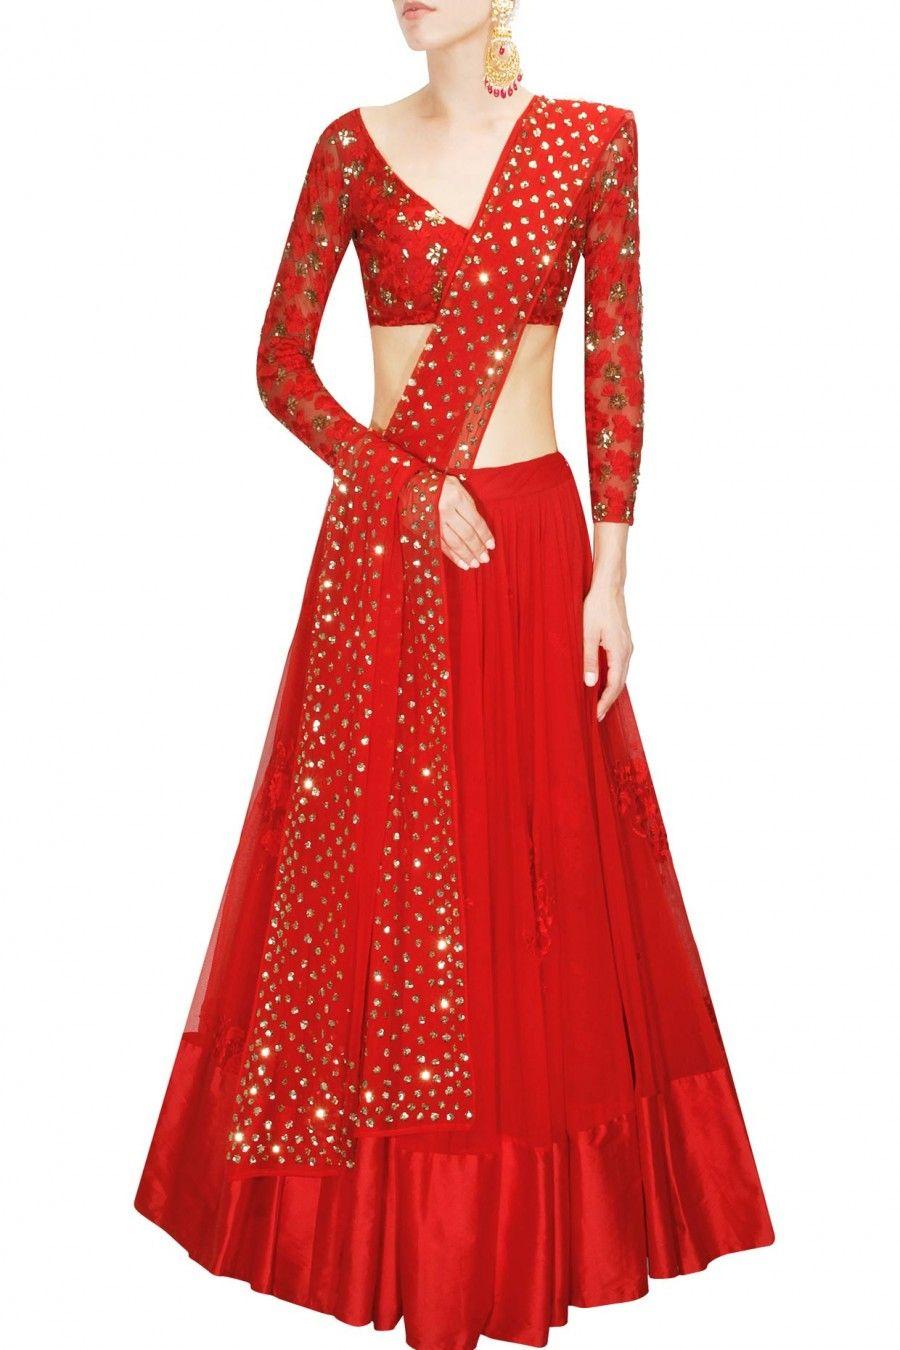 ASTHA NARANG Red embroidered lehenga set available only at Pernia\'s ...